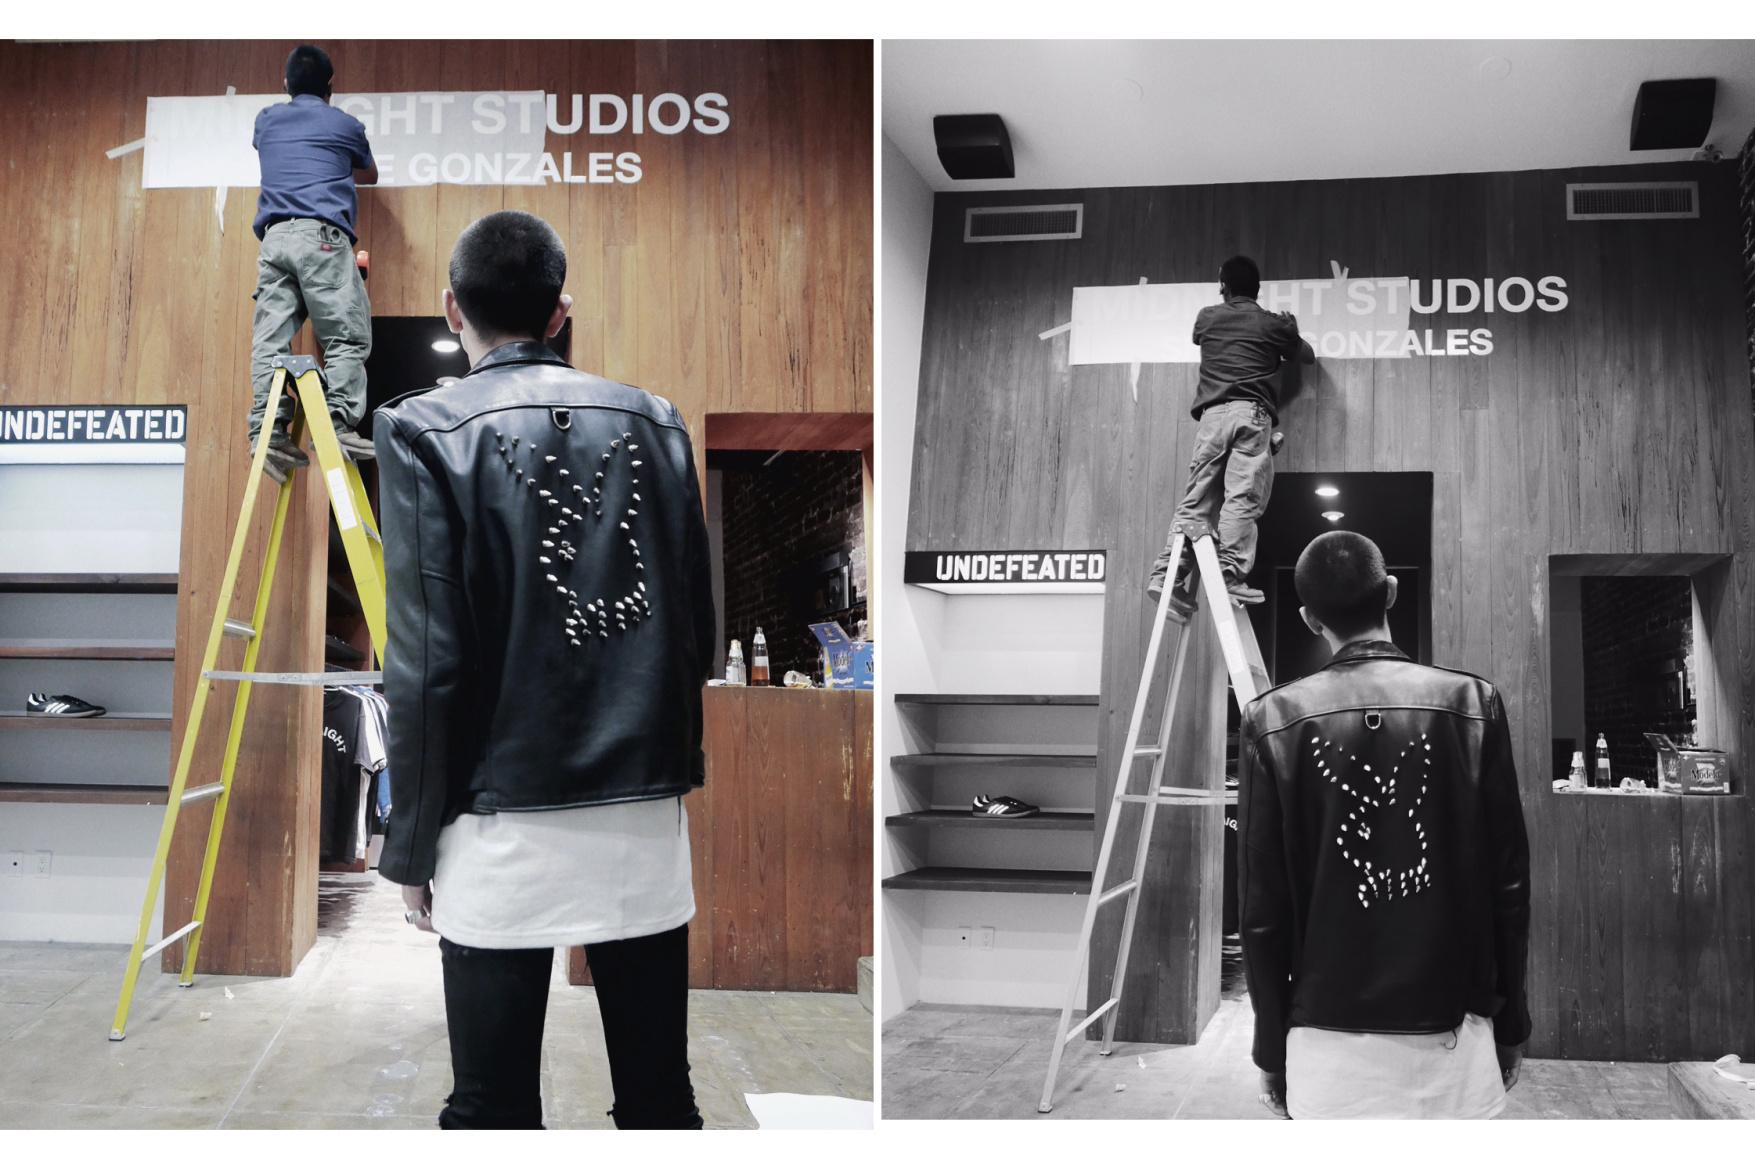 midnight-studios-los-angeles-pop-up-3